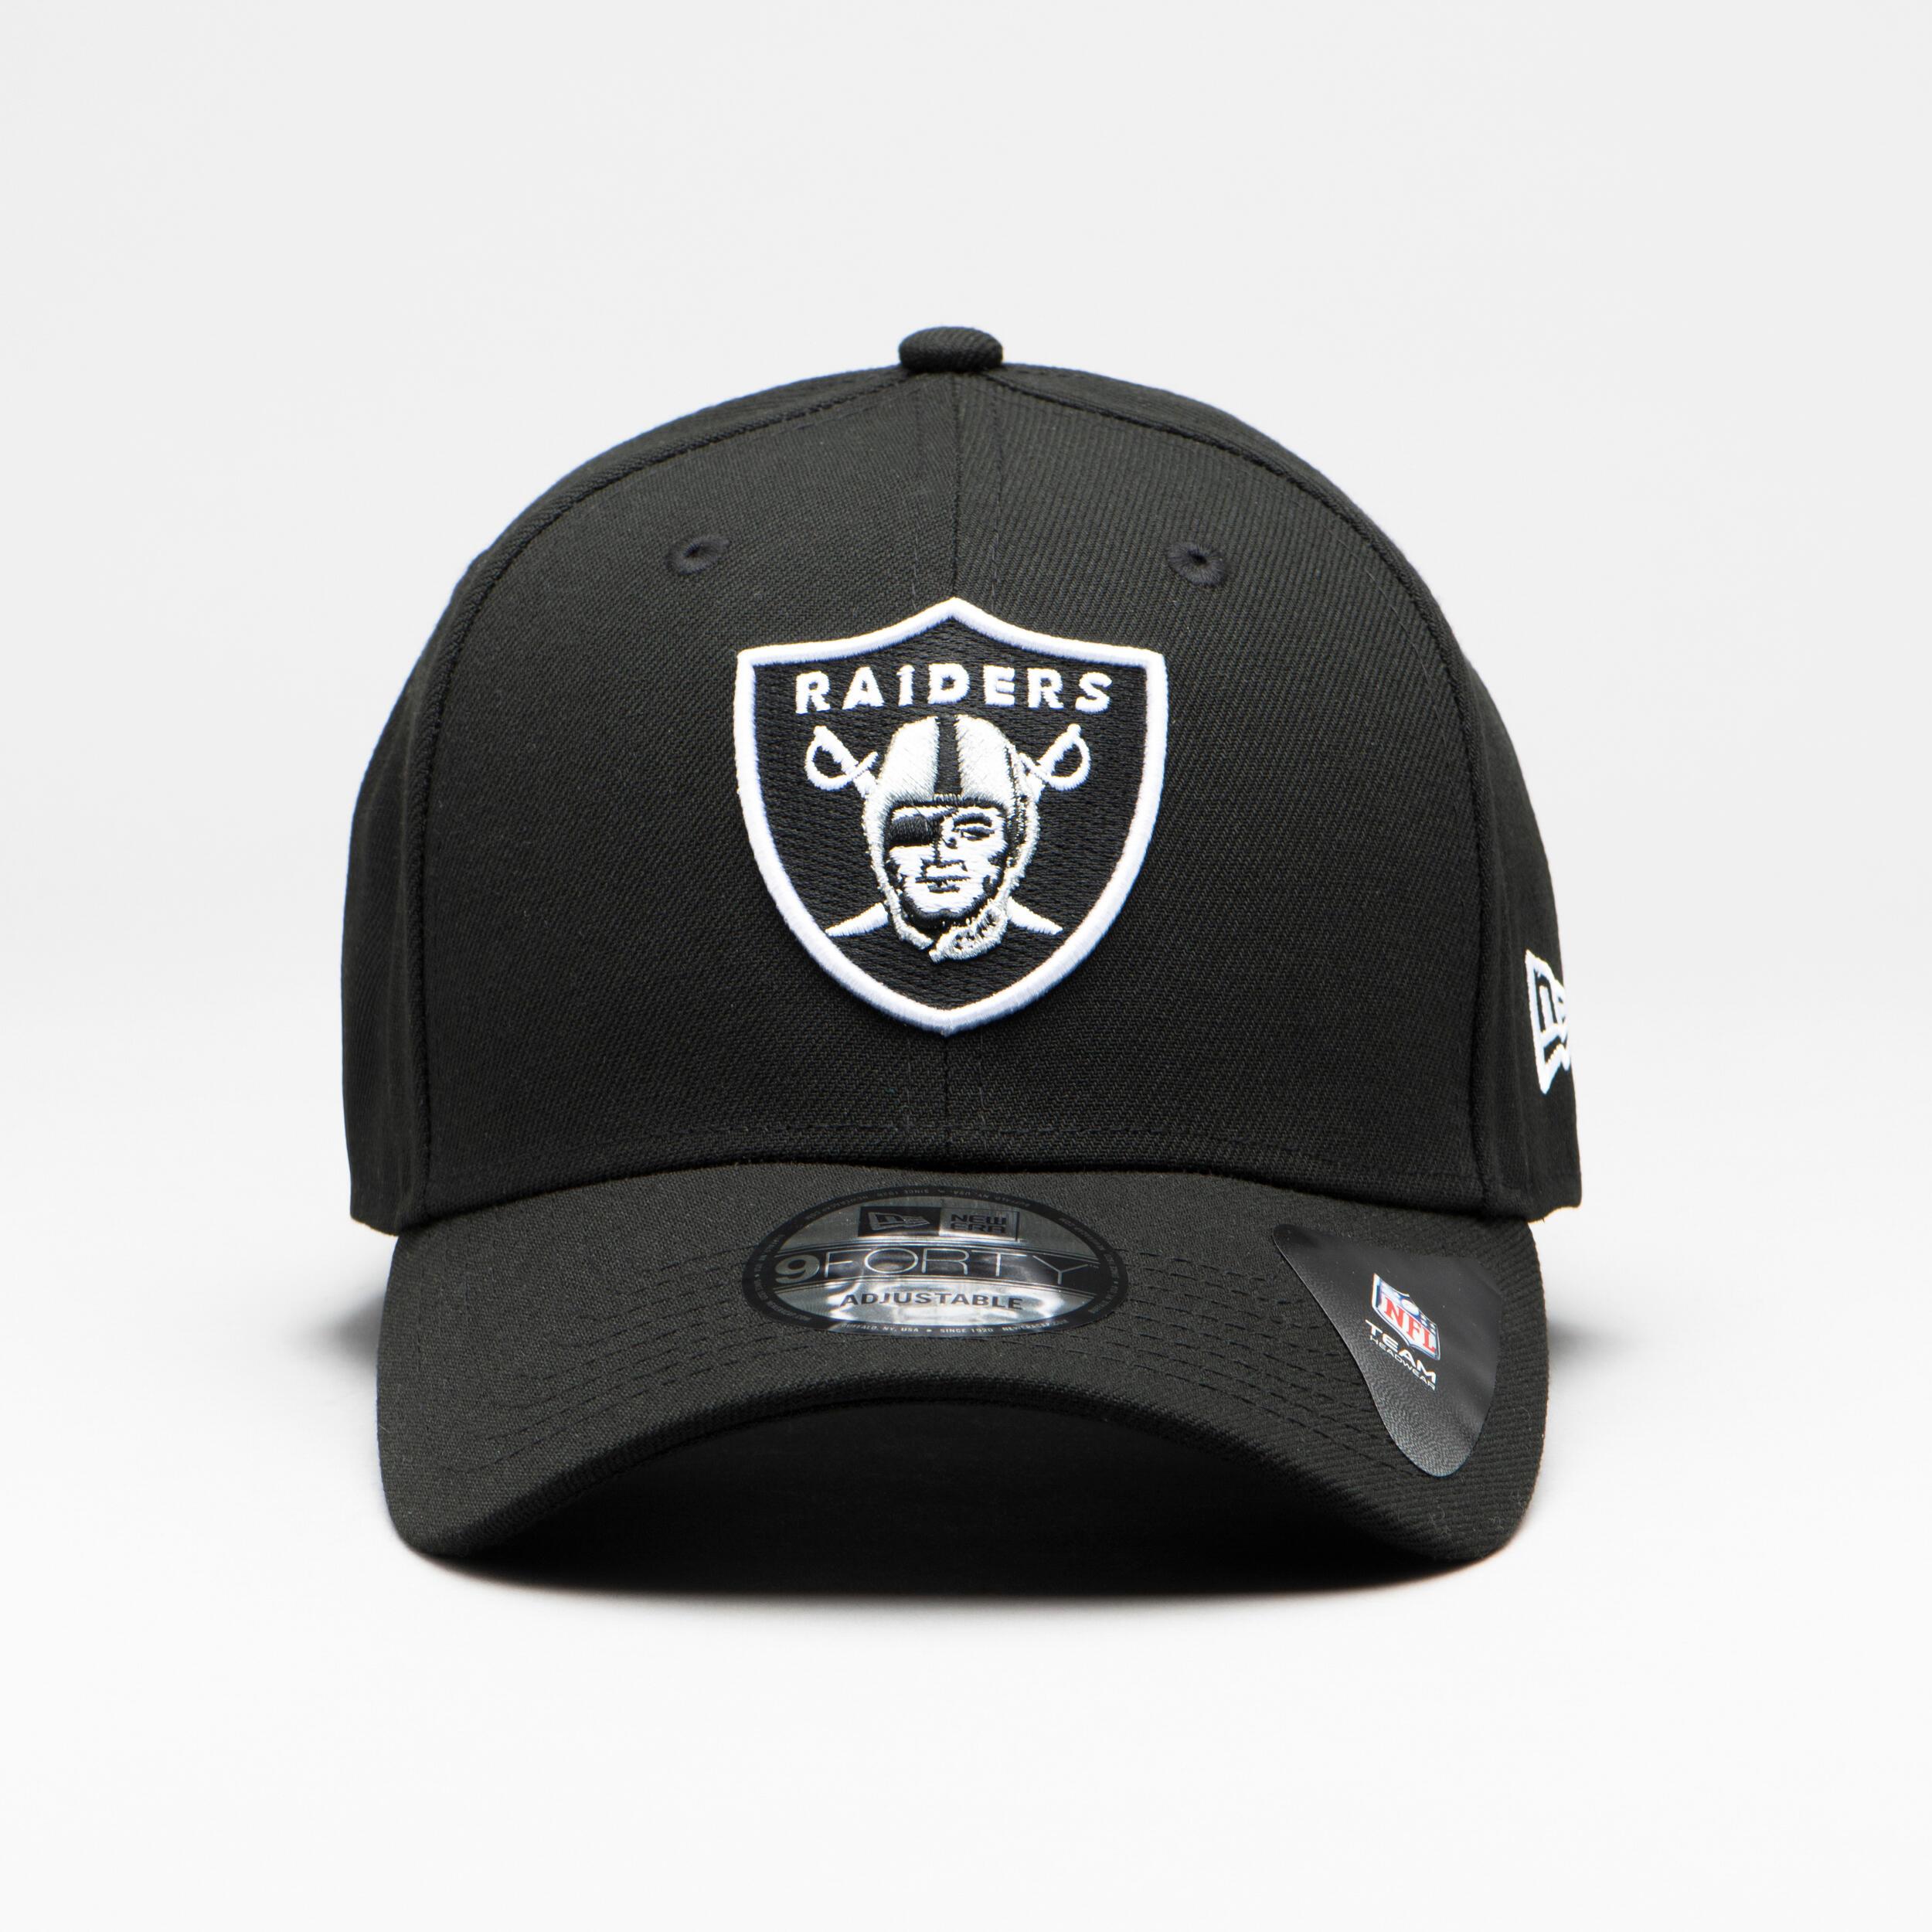 new era Cappellino football americano adulto RAIDERS NFL THE LEAGUE nero